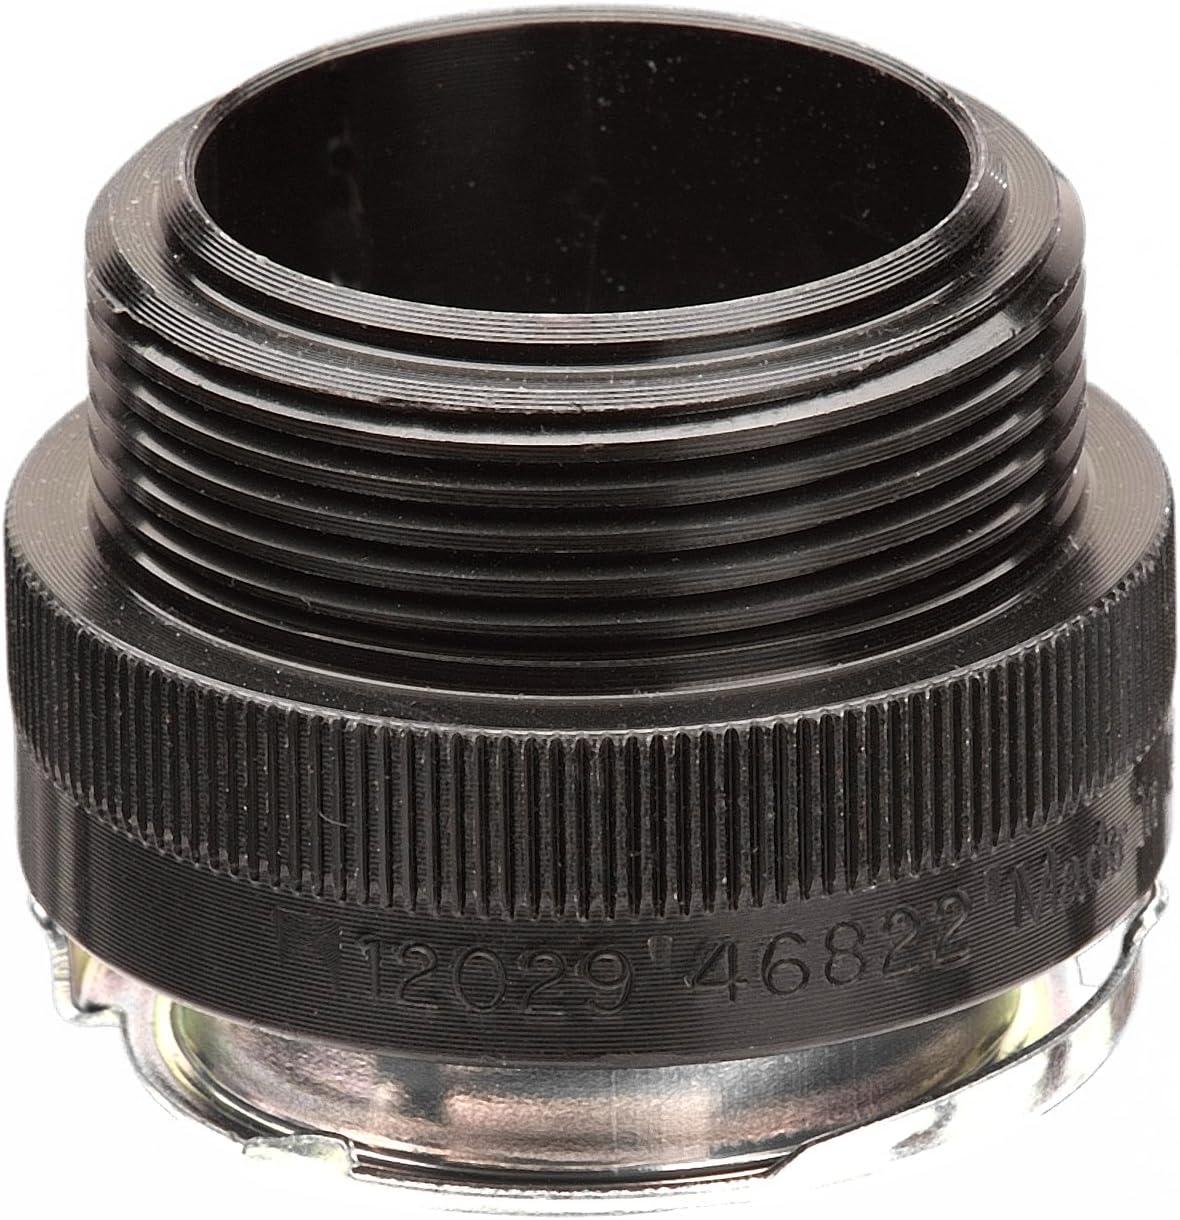 Stant 12029 Threaded Radiator Cap Adapter